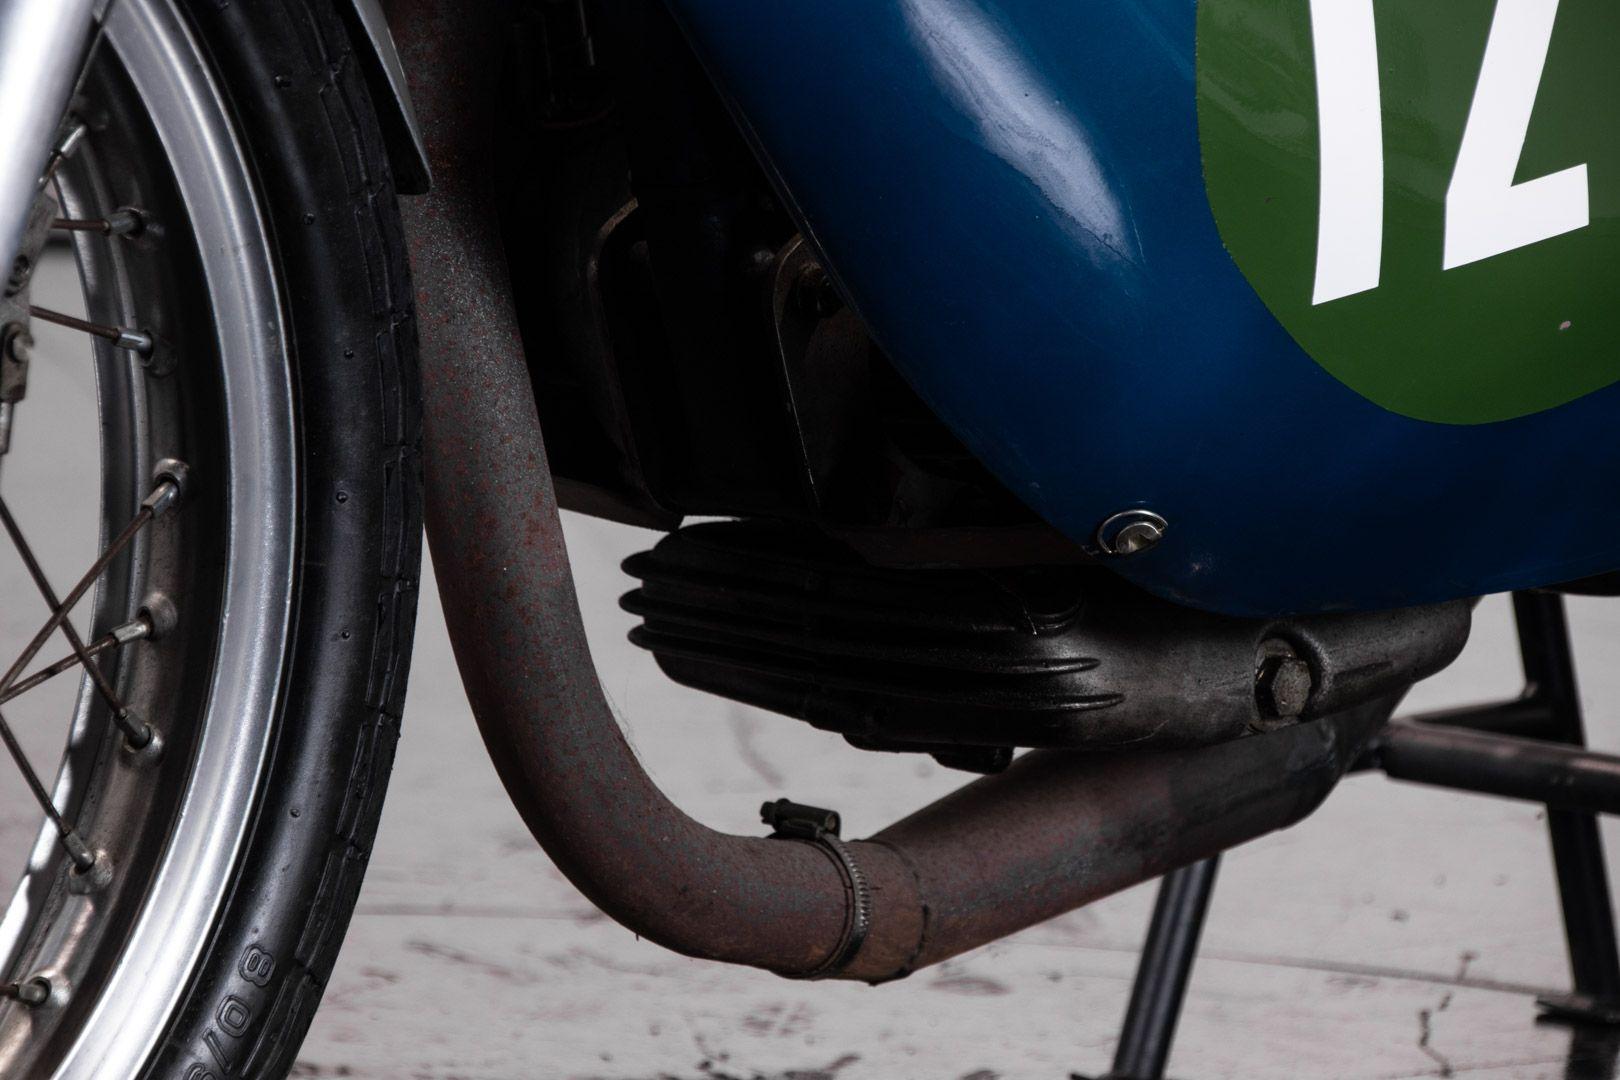 1960 Ducati Mach 1 Corsa NCR 82201